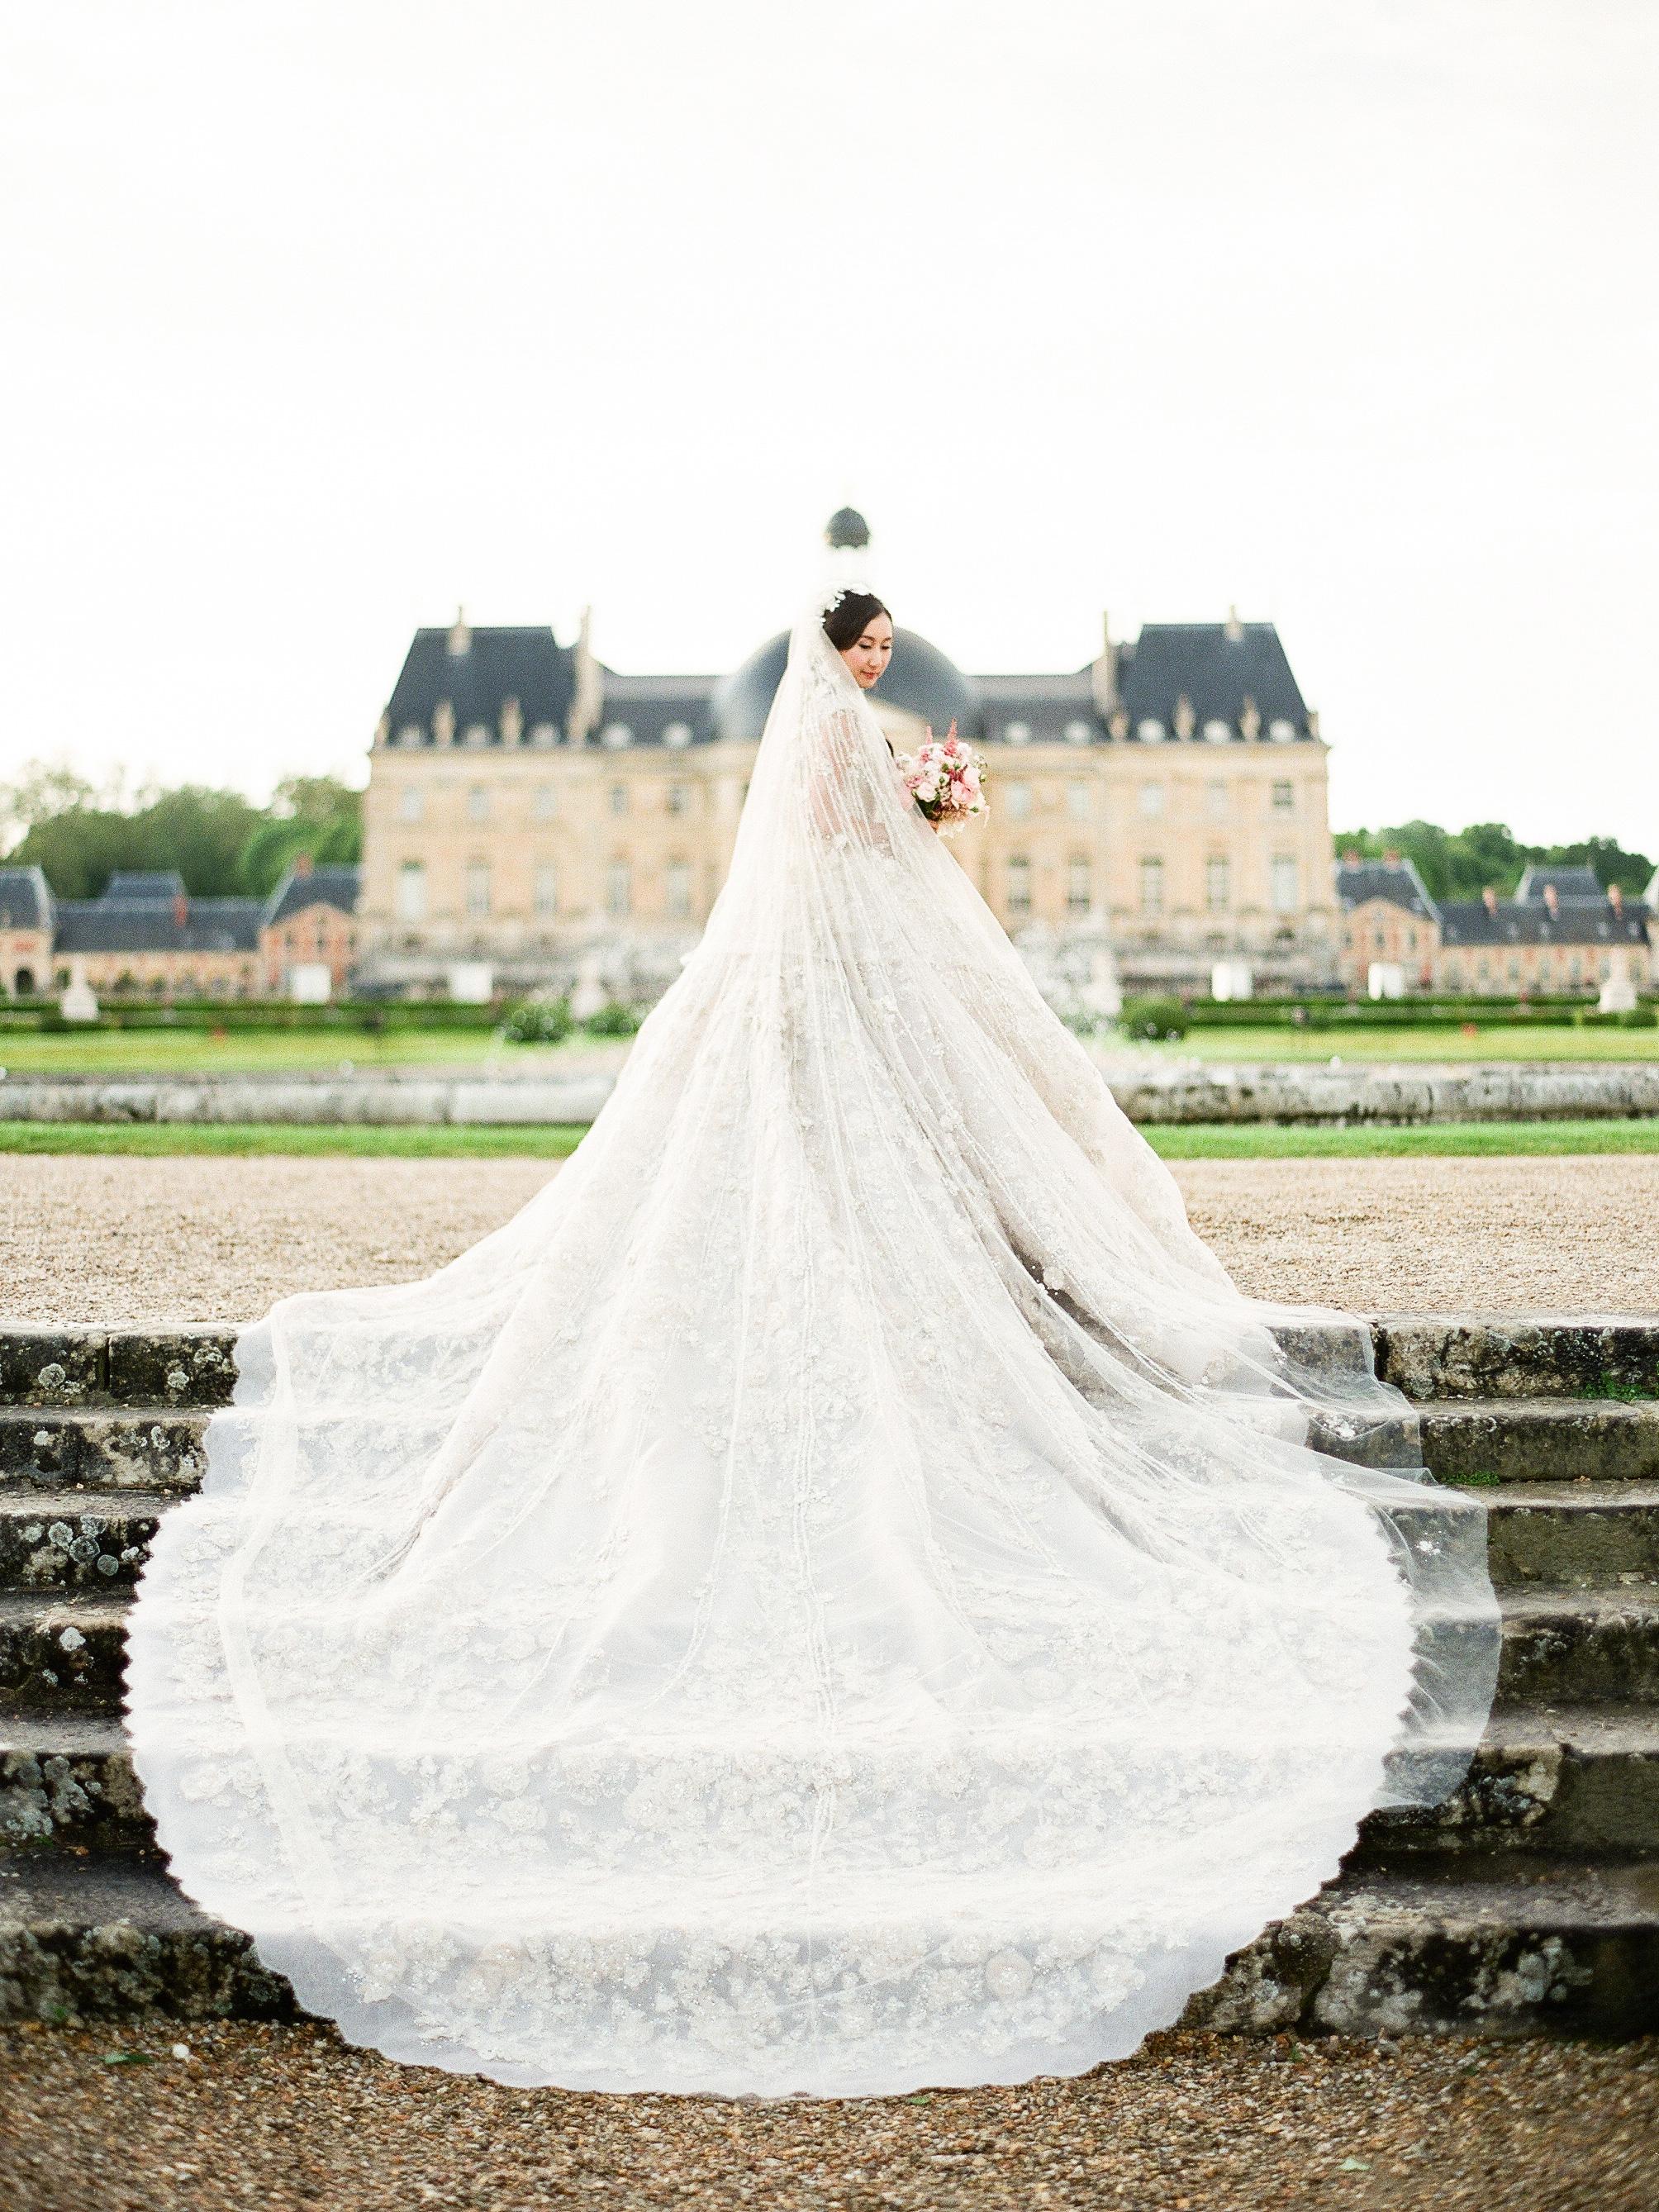 Society of illustrators wedding dress